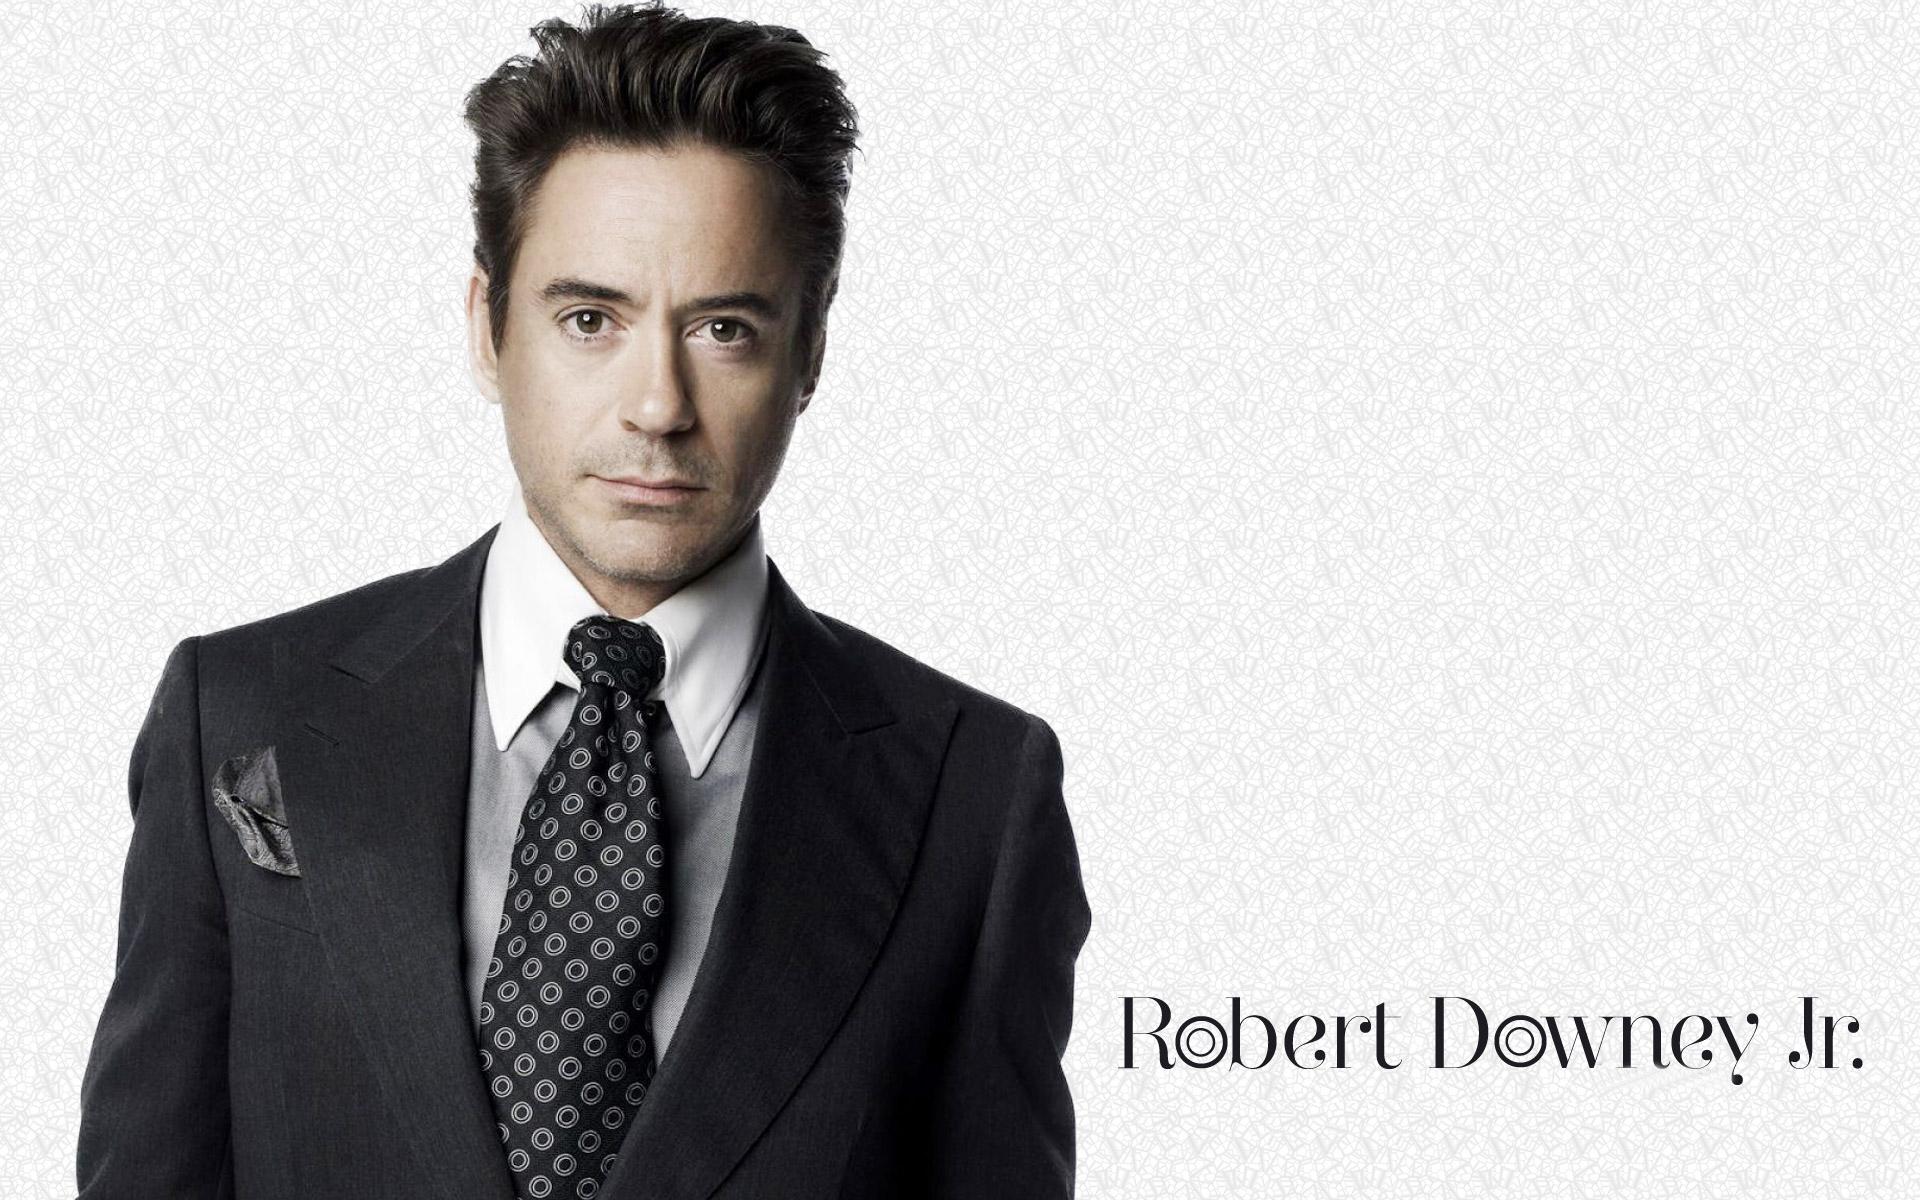 Robert Downey Jr Hd